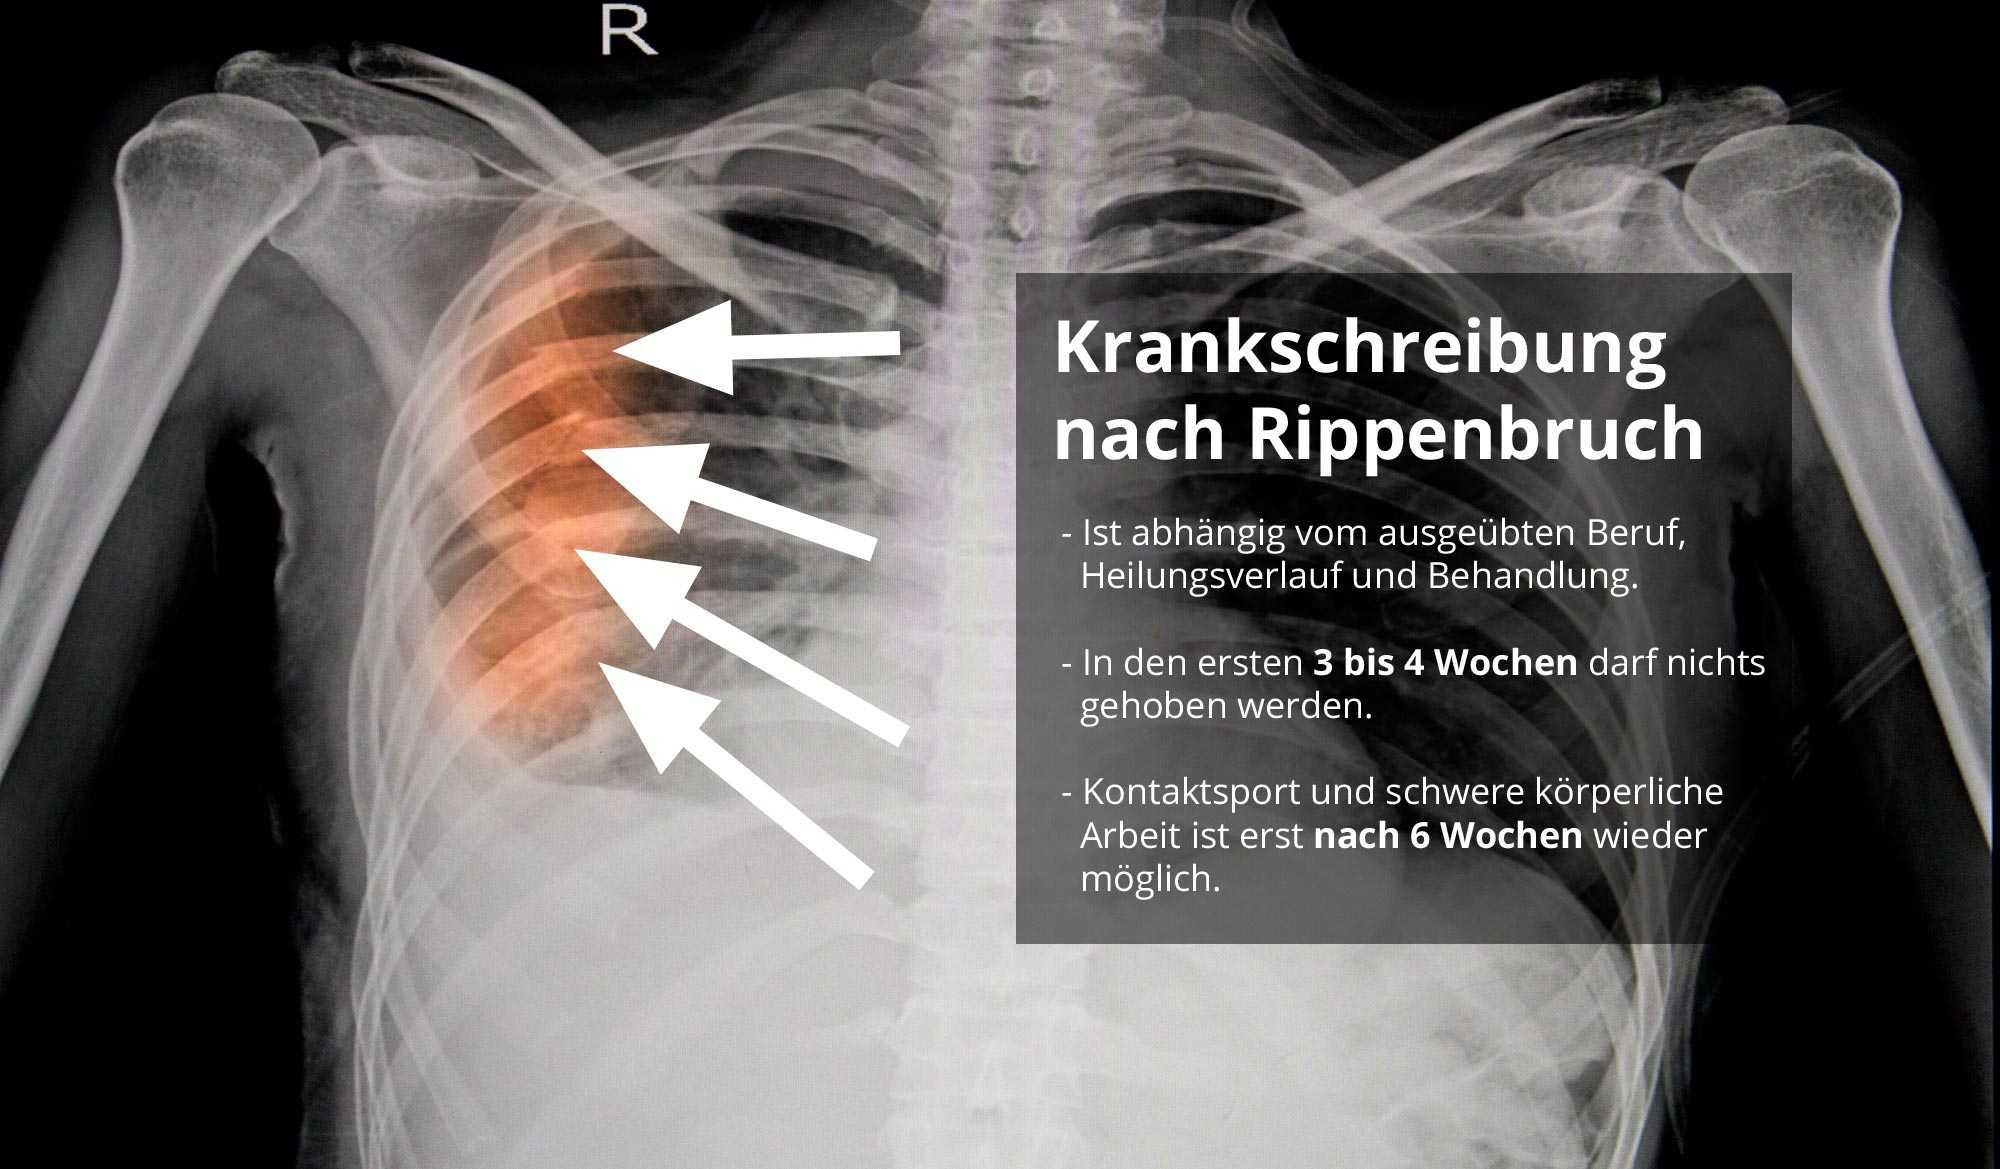 pneumothorax wie lange dauert die heilung